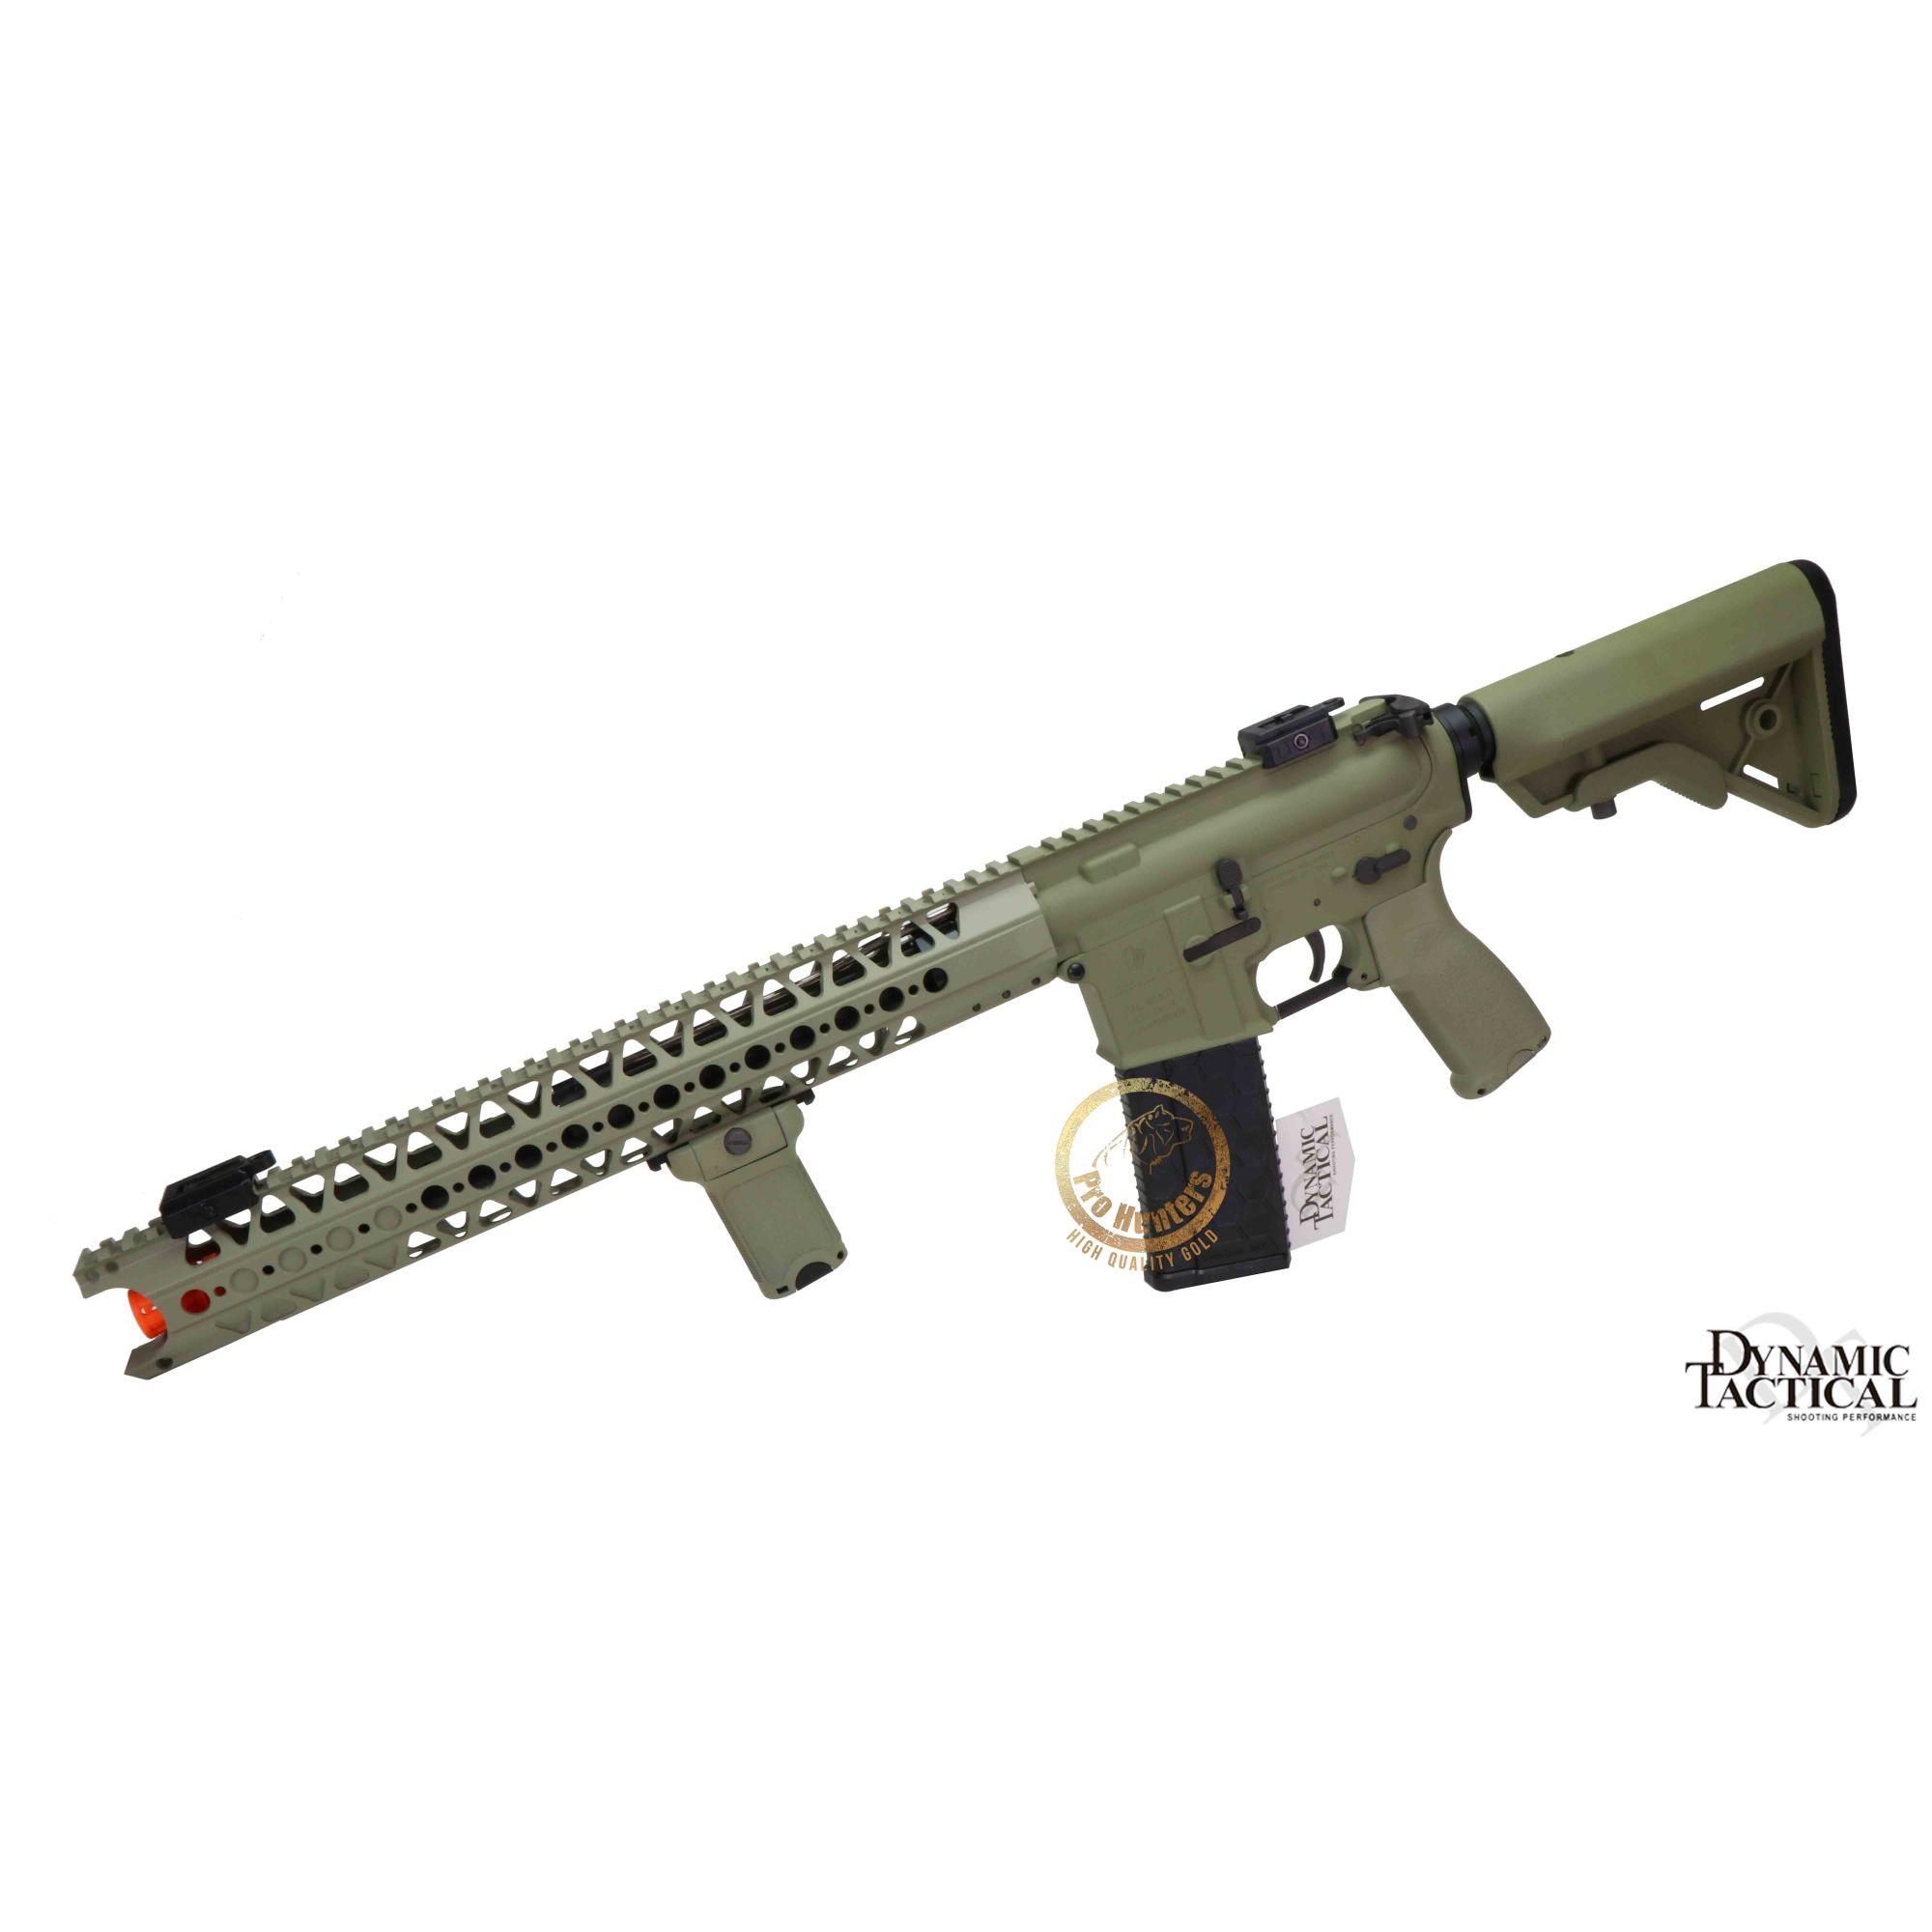 Rifle Airsoft Dytac LA M4 Carbine - Warsport Foliage